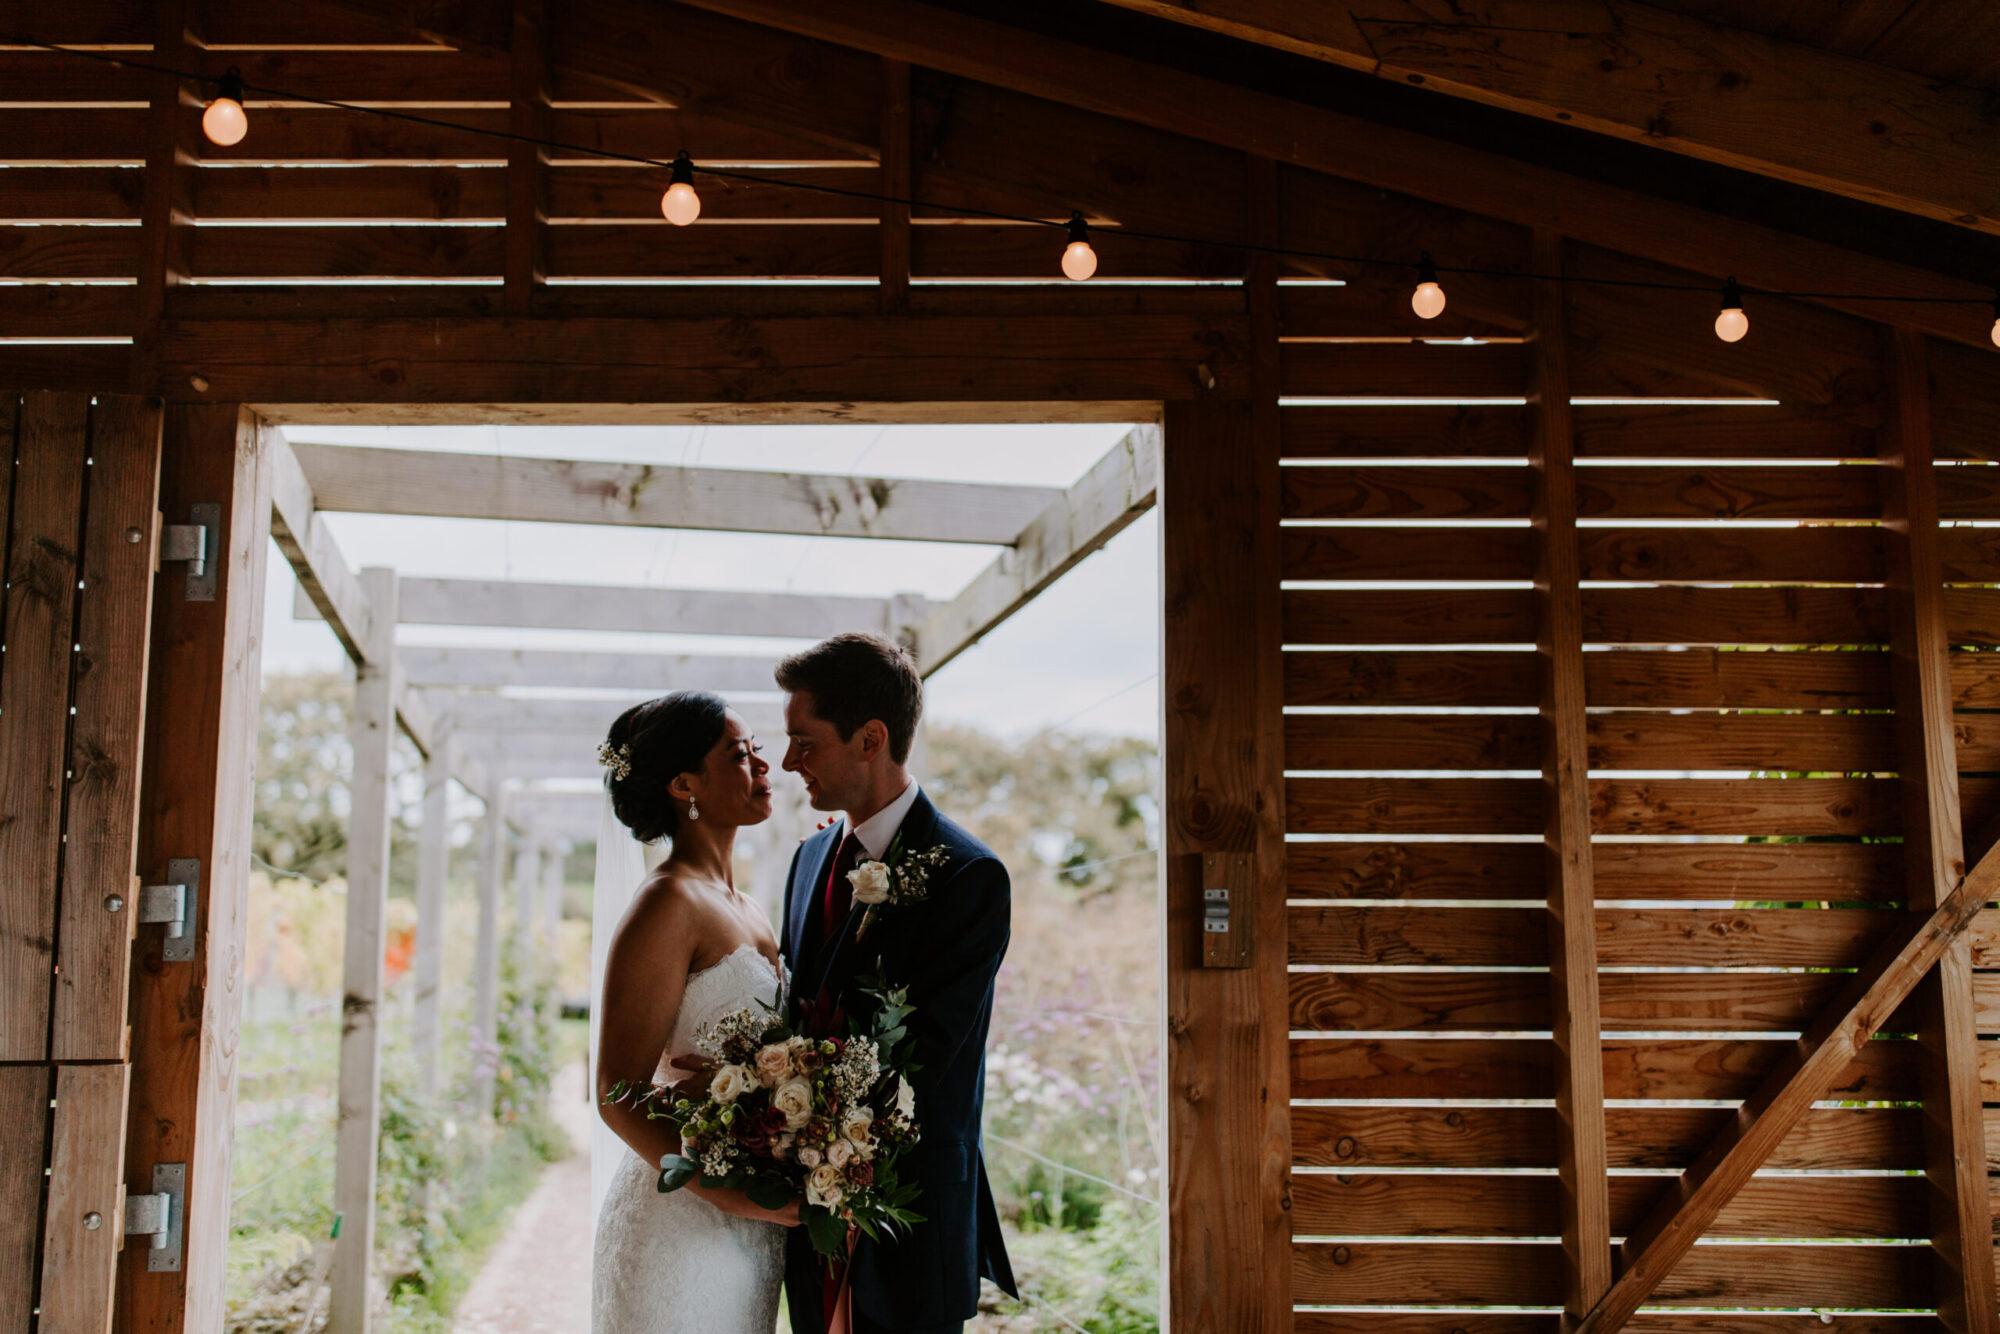 Trevibban Mill Wedding venue location